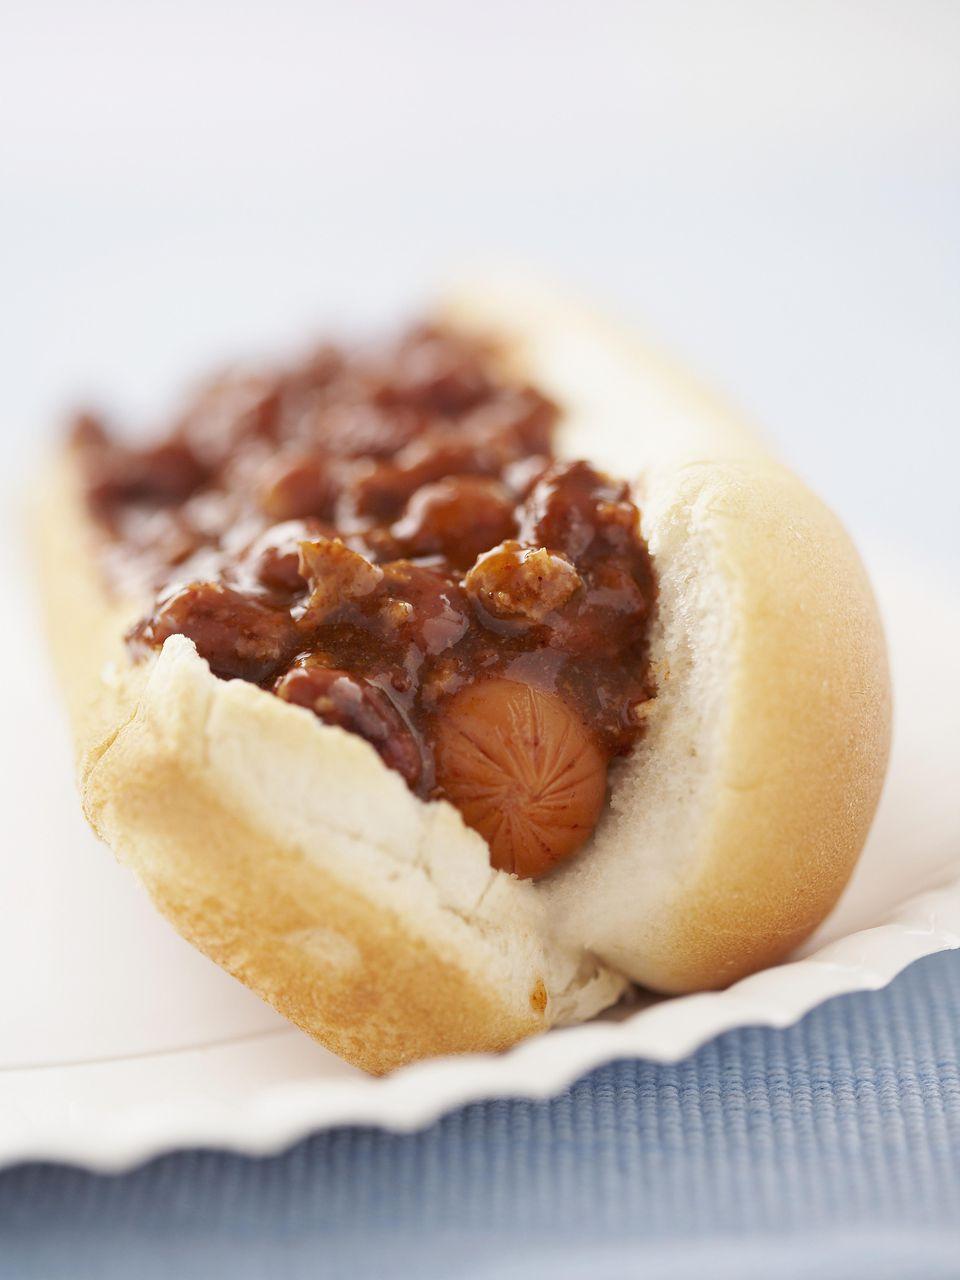 Crockpot Chili Dog